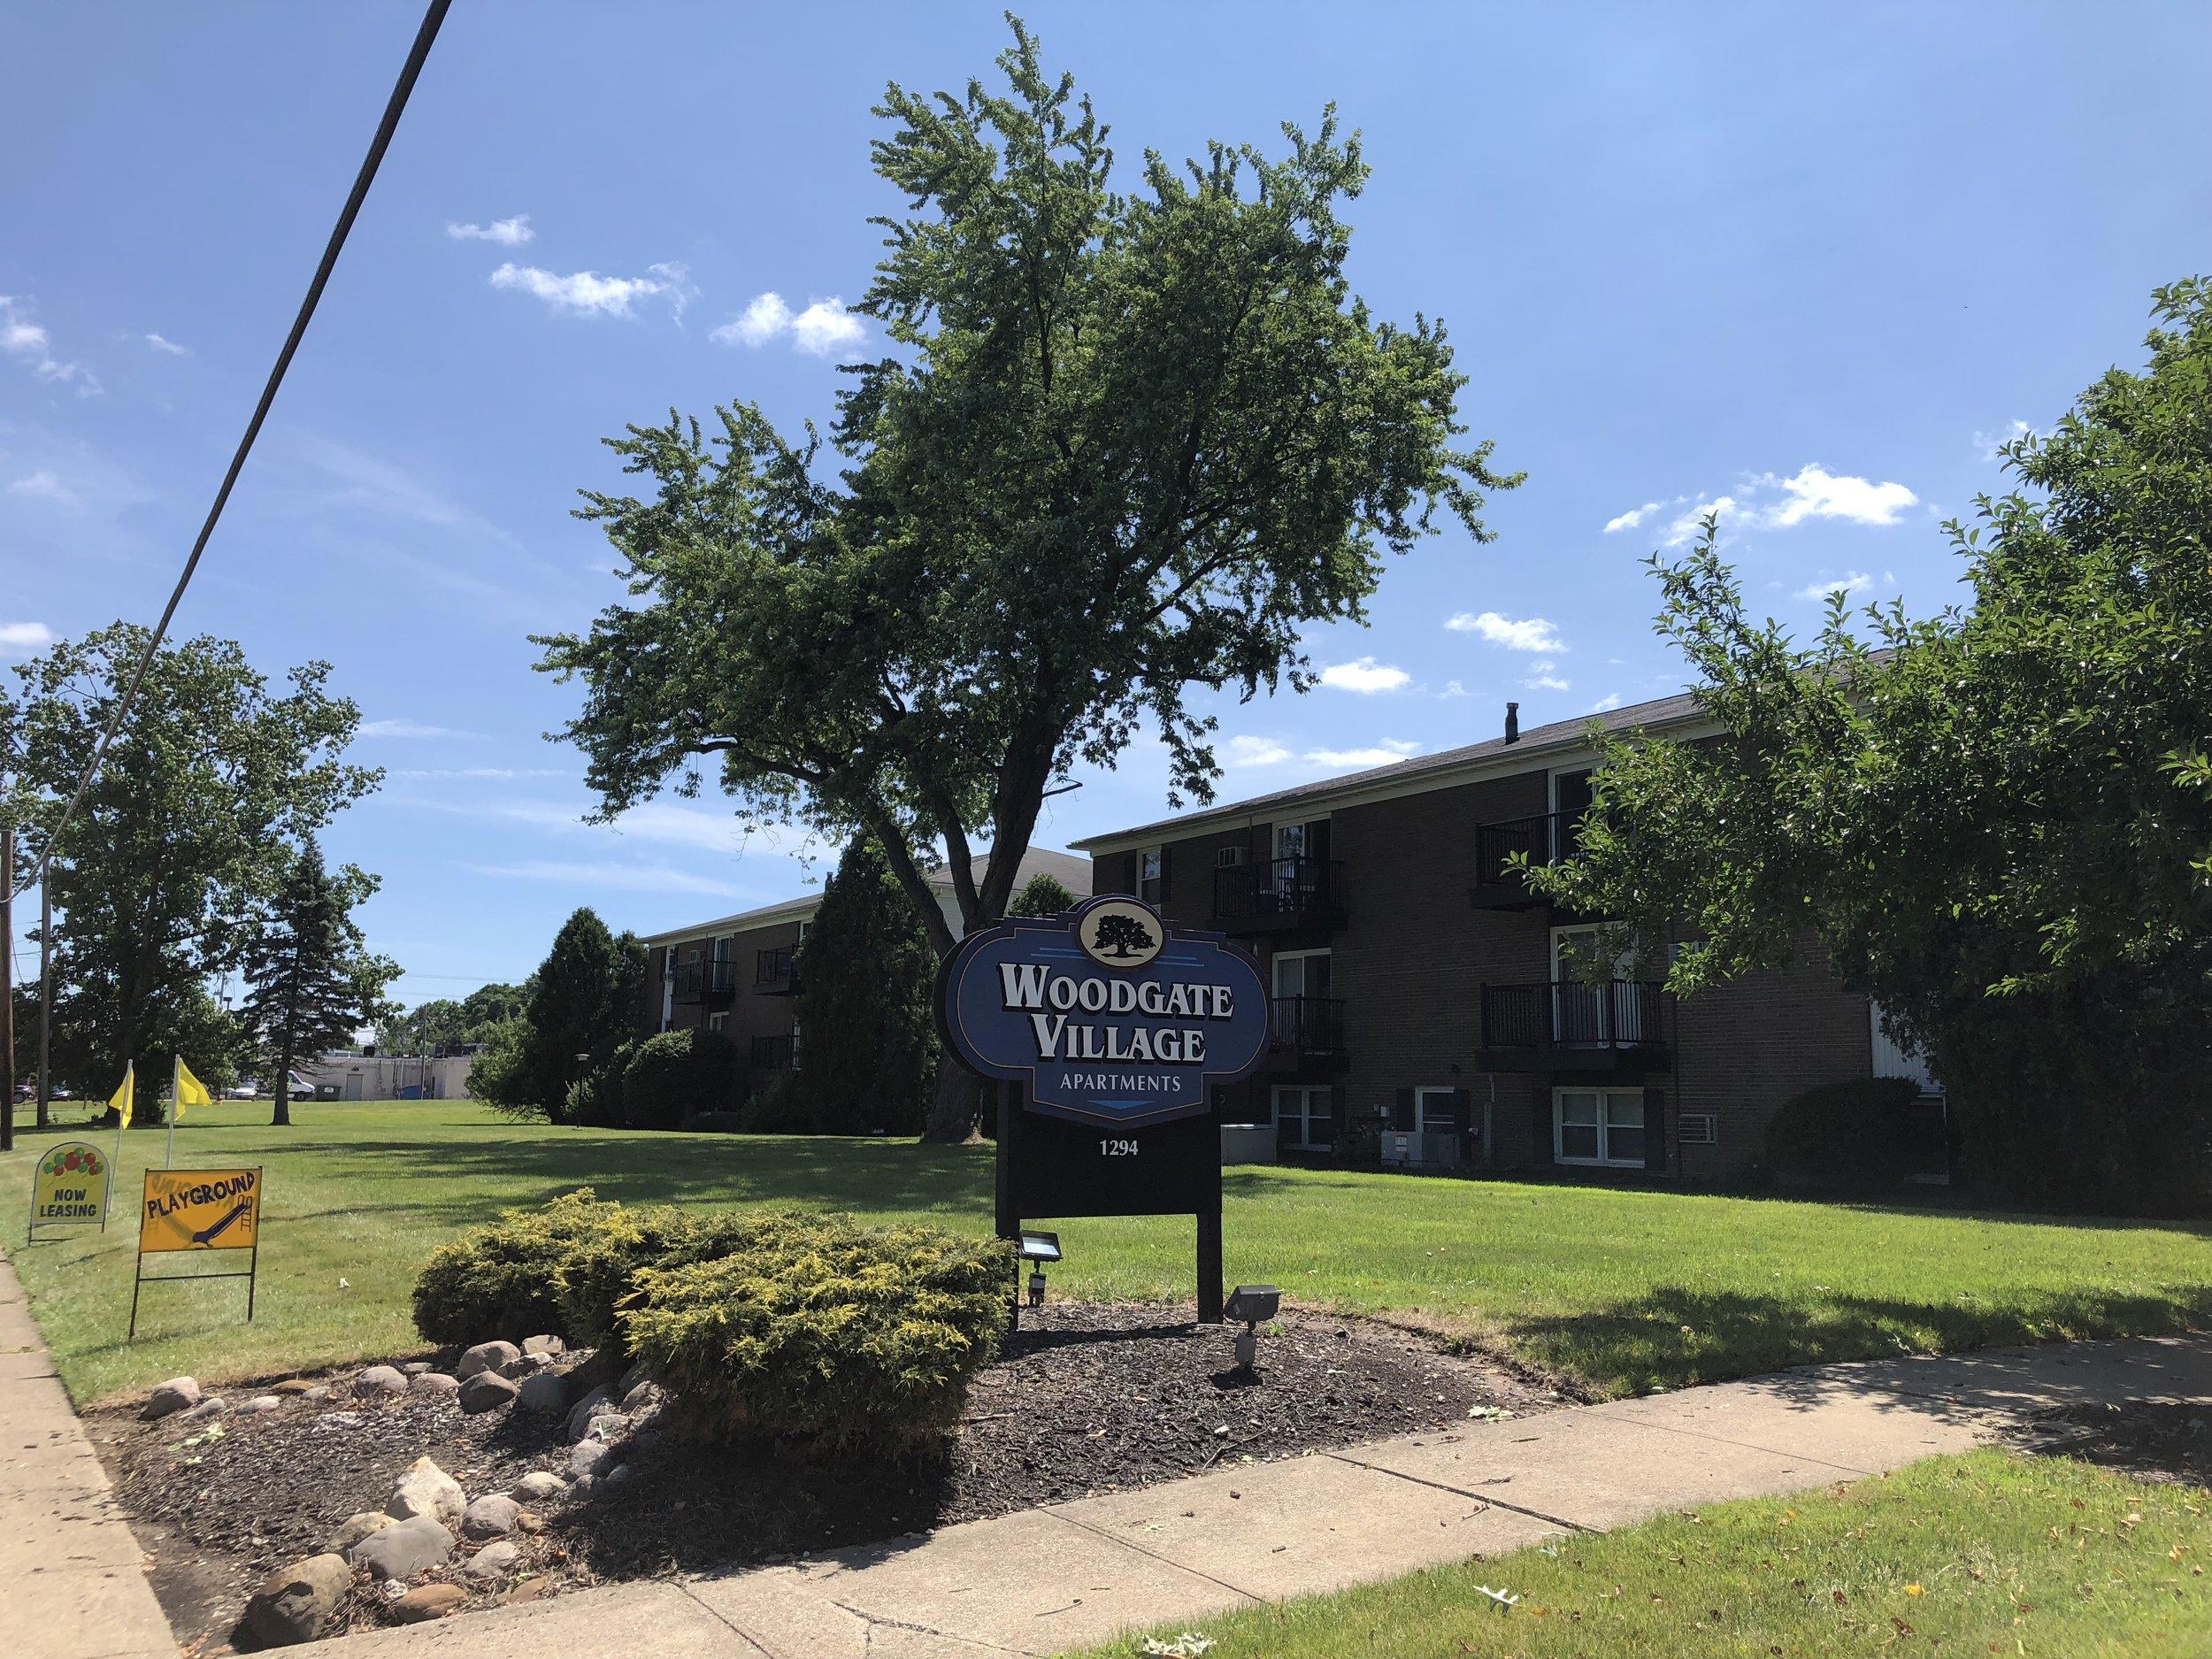 Woodgate Village Apartments - Brunswick, Ohio